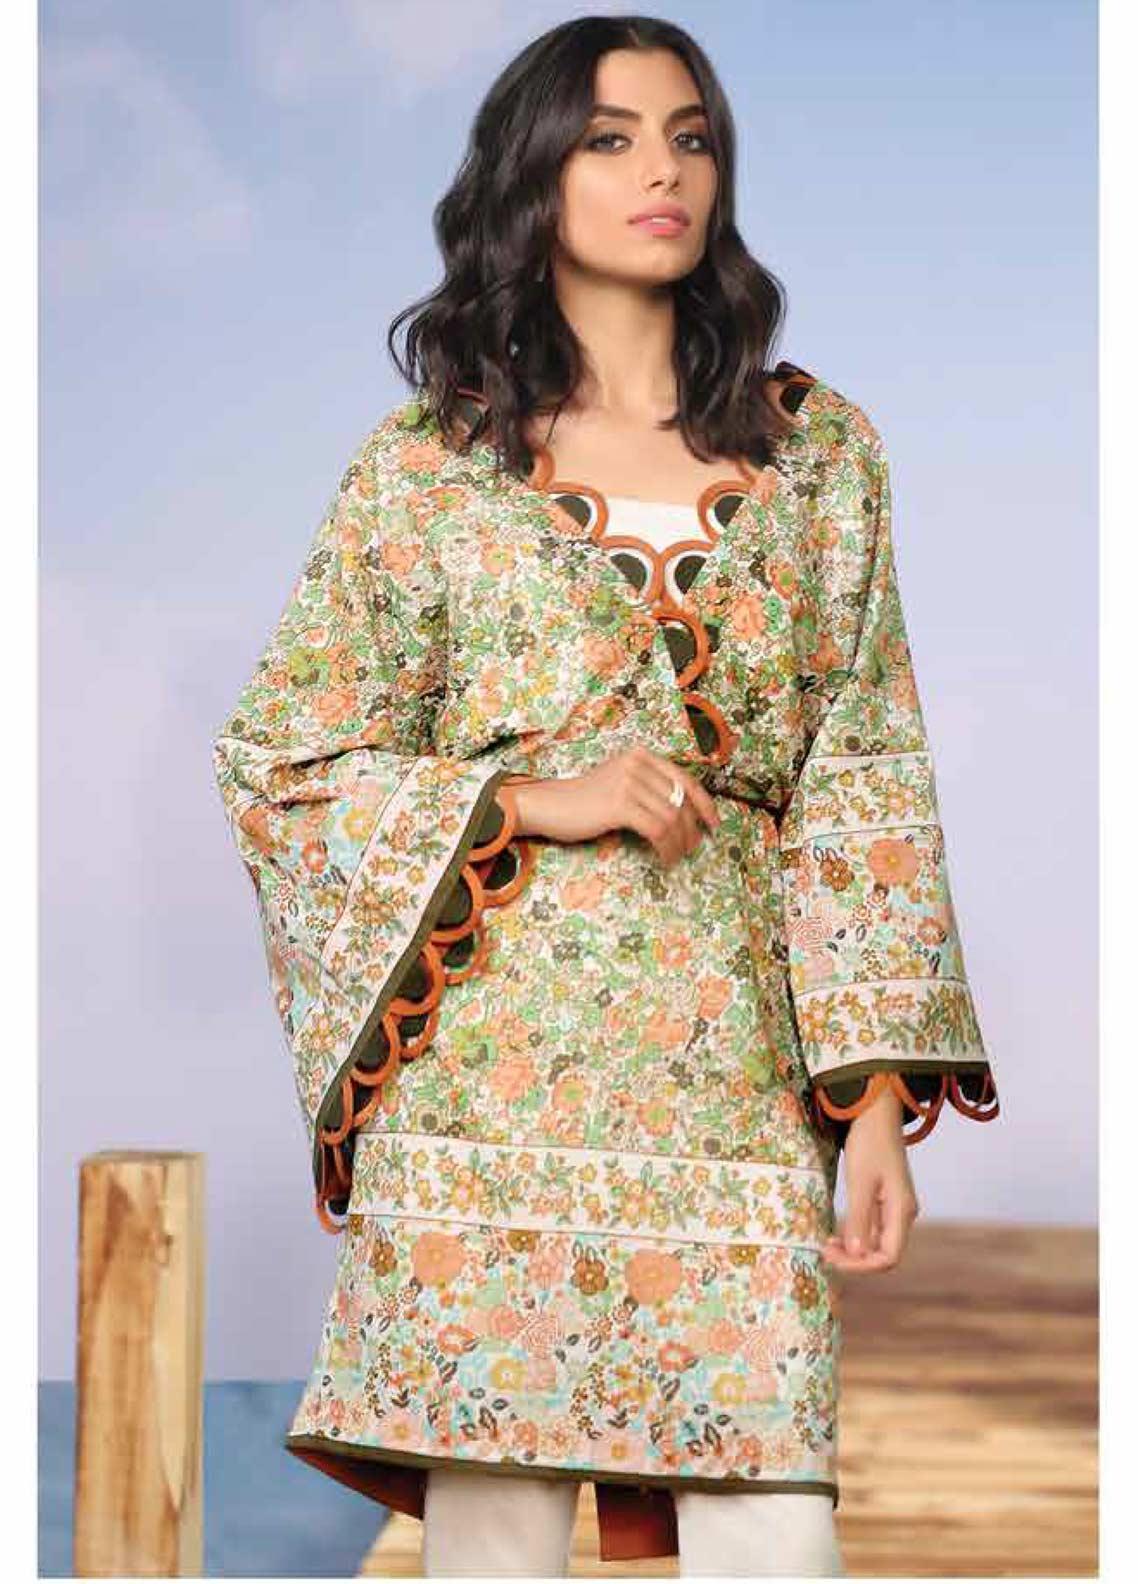 Al Karam Printed Lawn Unstitched 2 Piece Suit AK19-L2 20 GREEN - Spring / Summer Collection